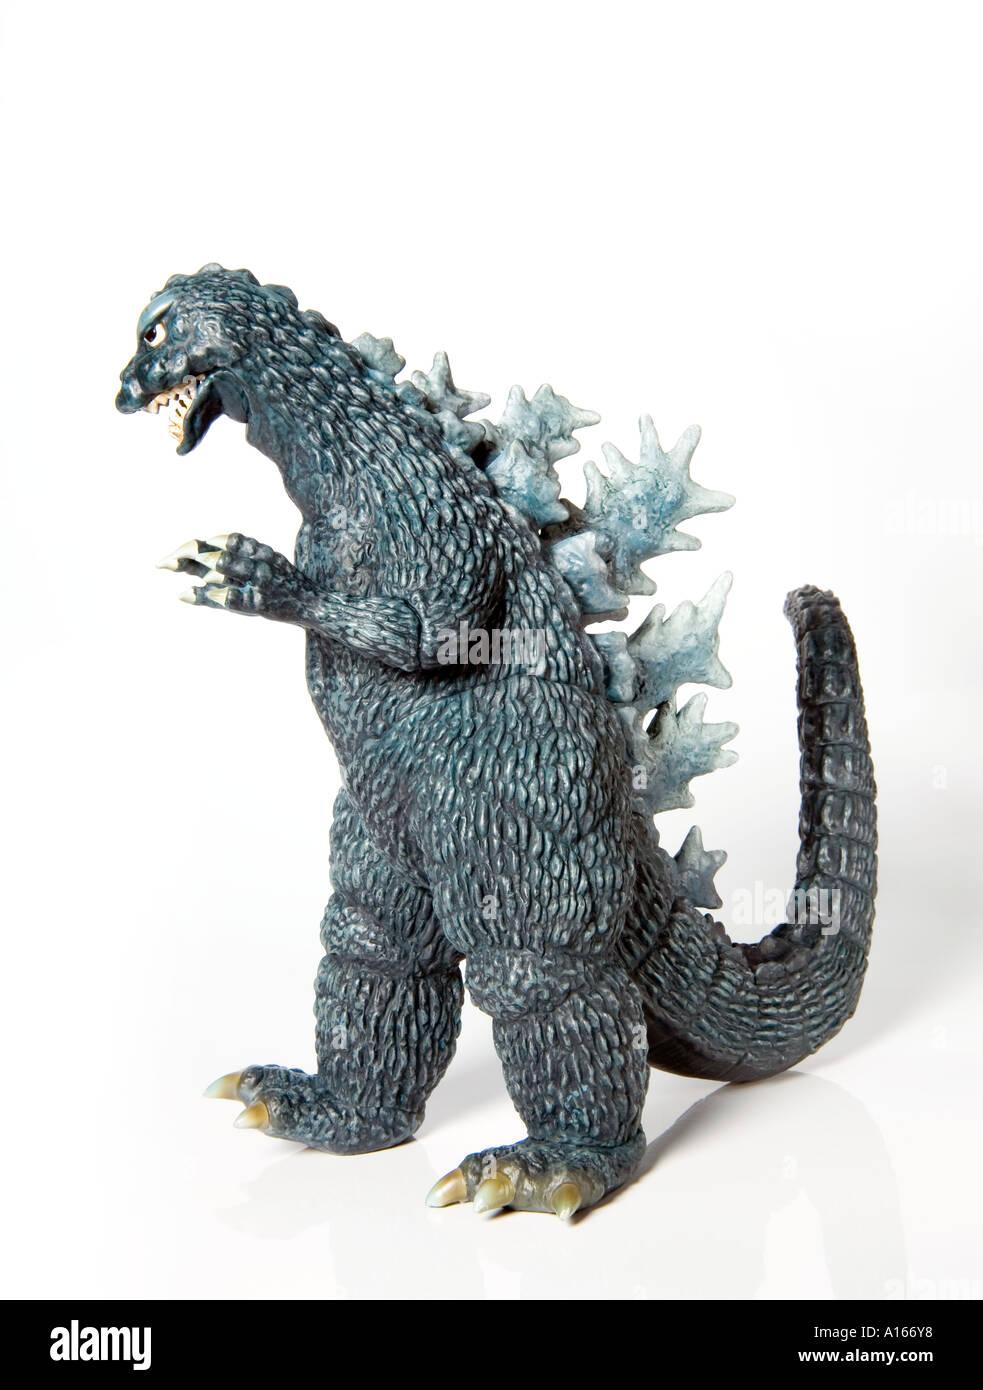 Godzilla Toy - Stock Image